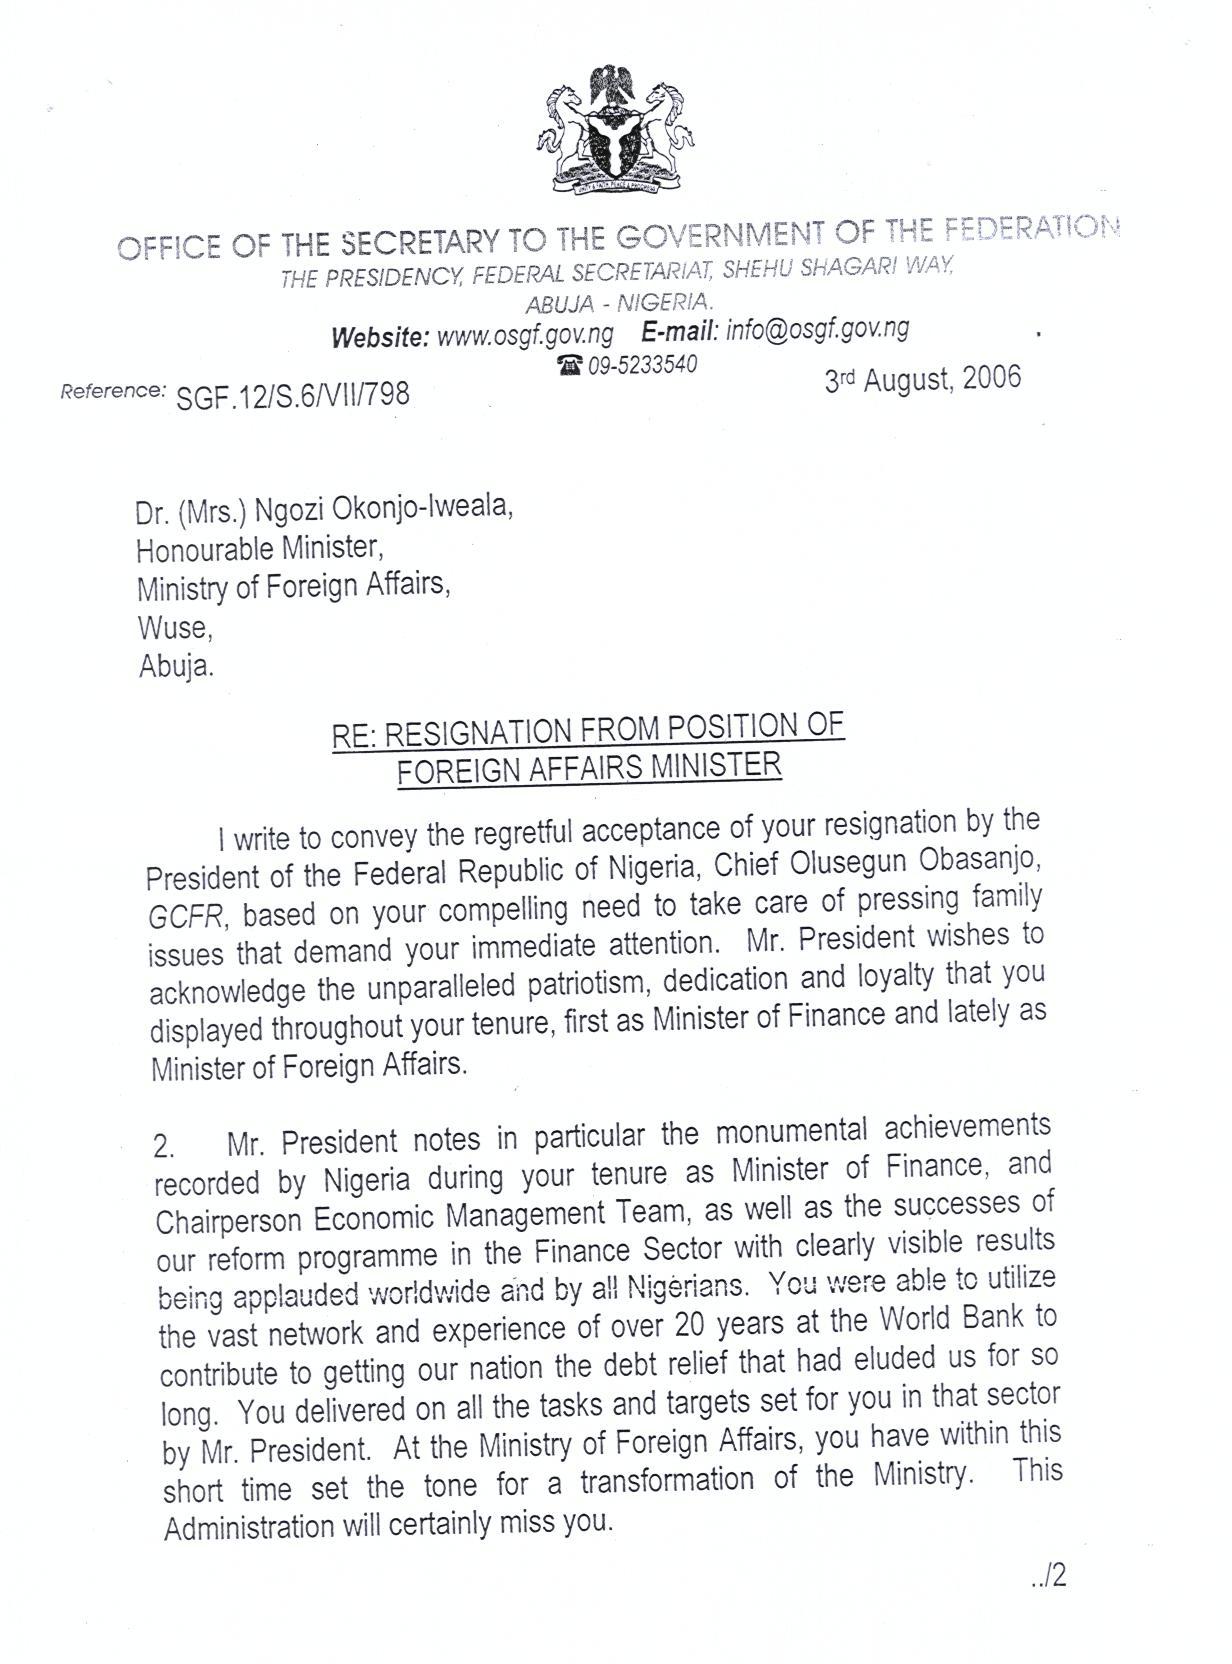 response to resignation letter informatin for letter resignation letter template fgn s response to dr okonjo iweala s resignation